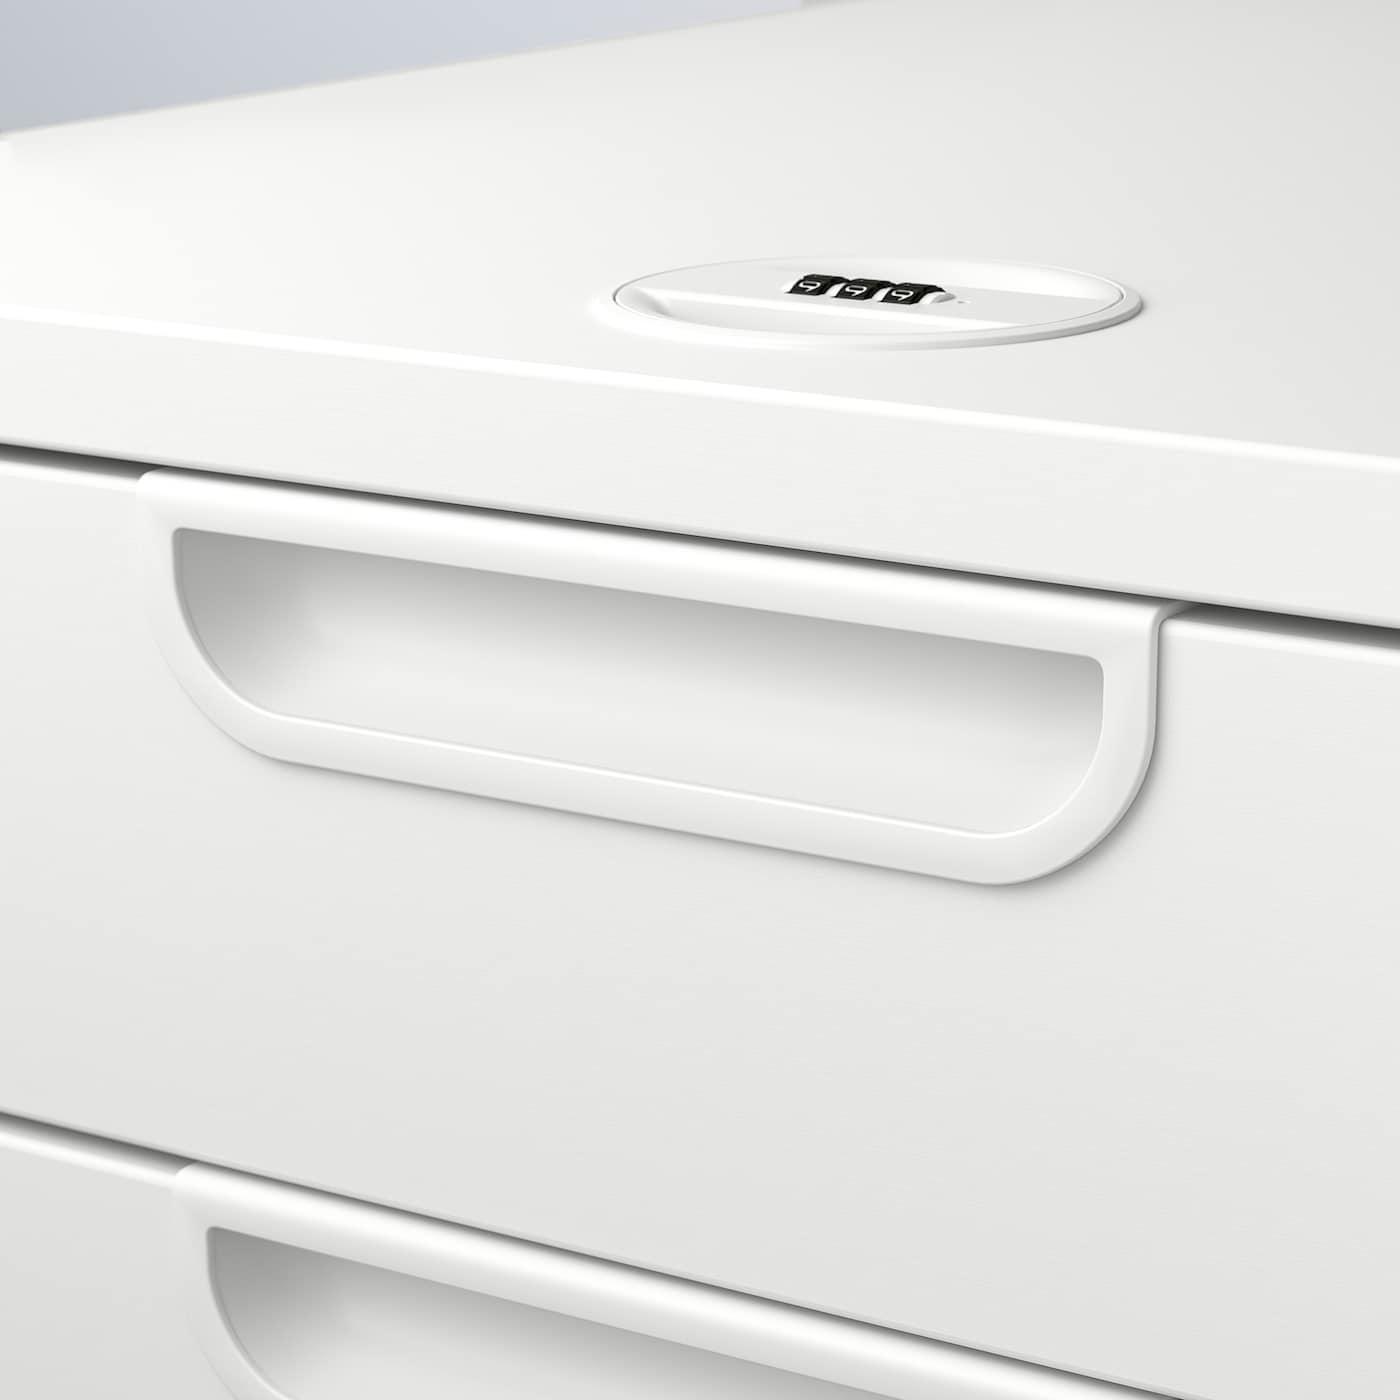 Image of: Galant Drawer Unit Drop File Storage White 17 3 4×21 5 8 Ikea